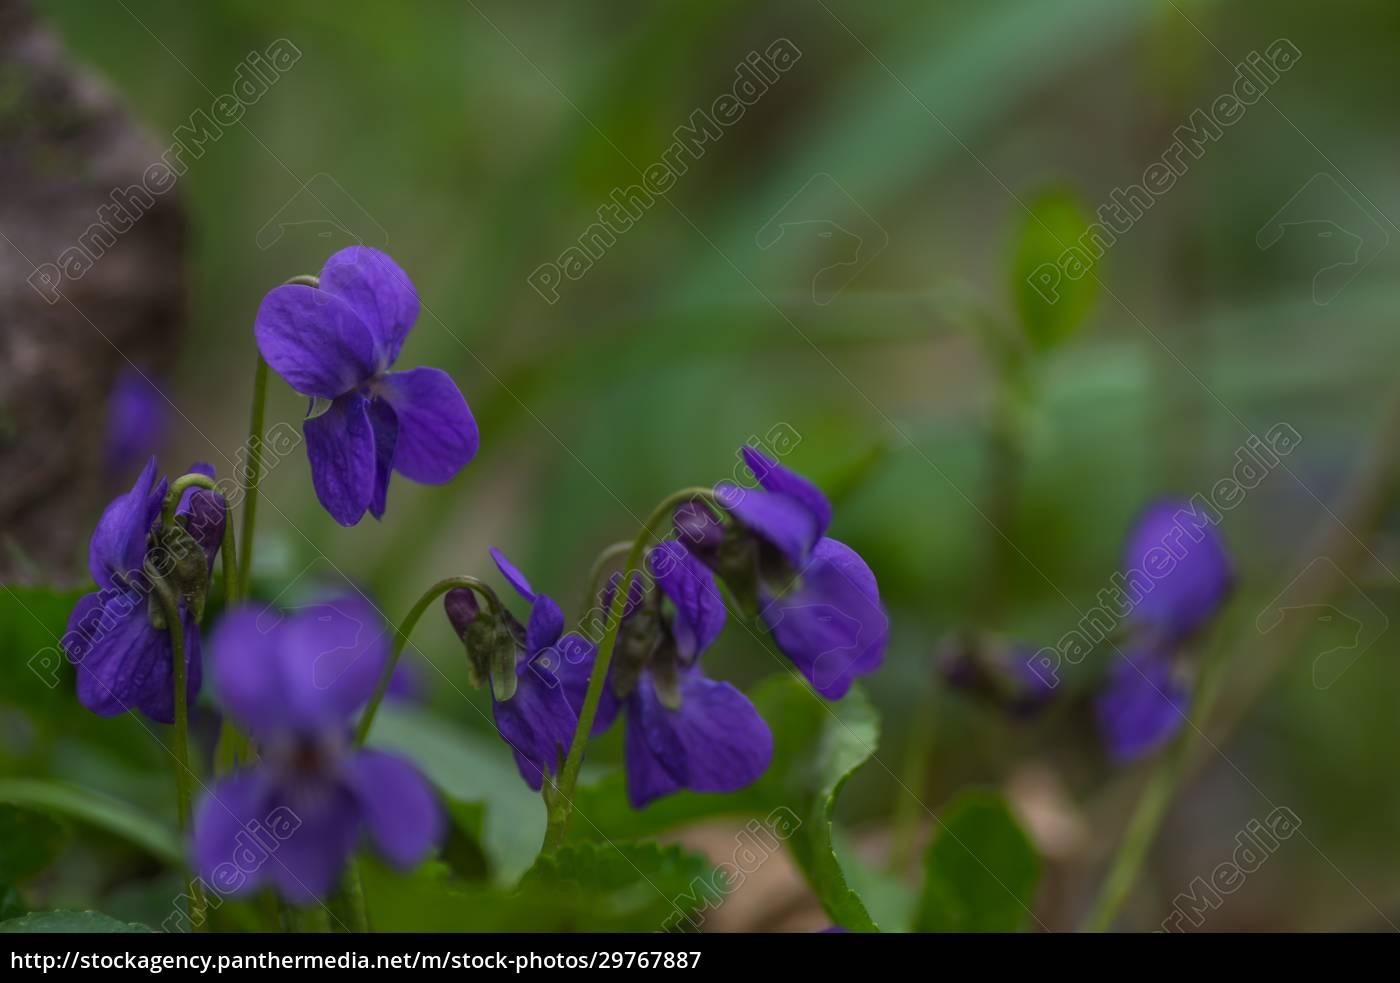 fresh, fragrant, violet, in, the, green - 29767887